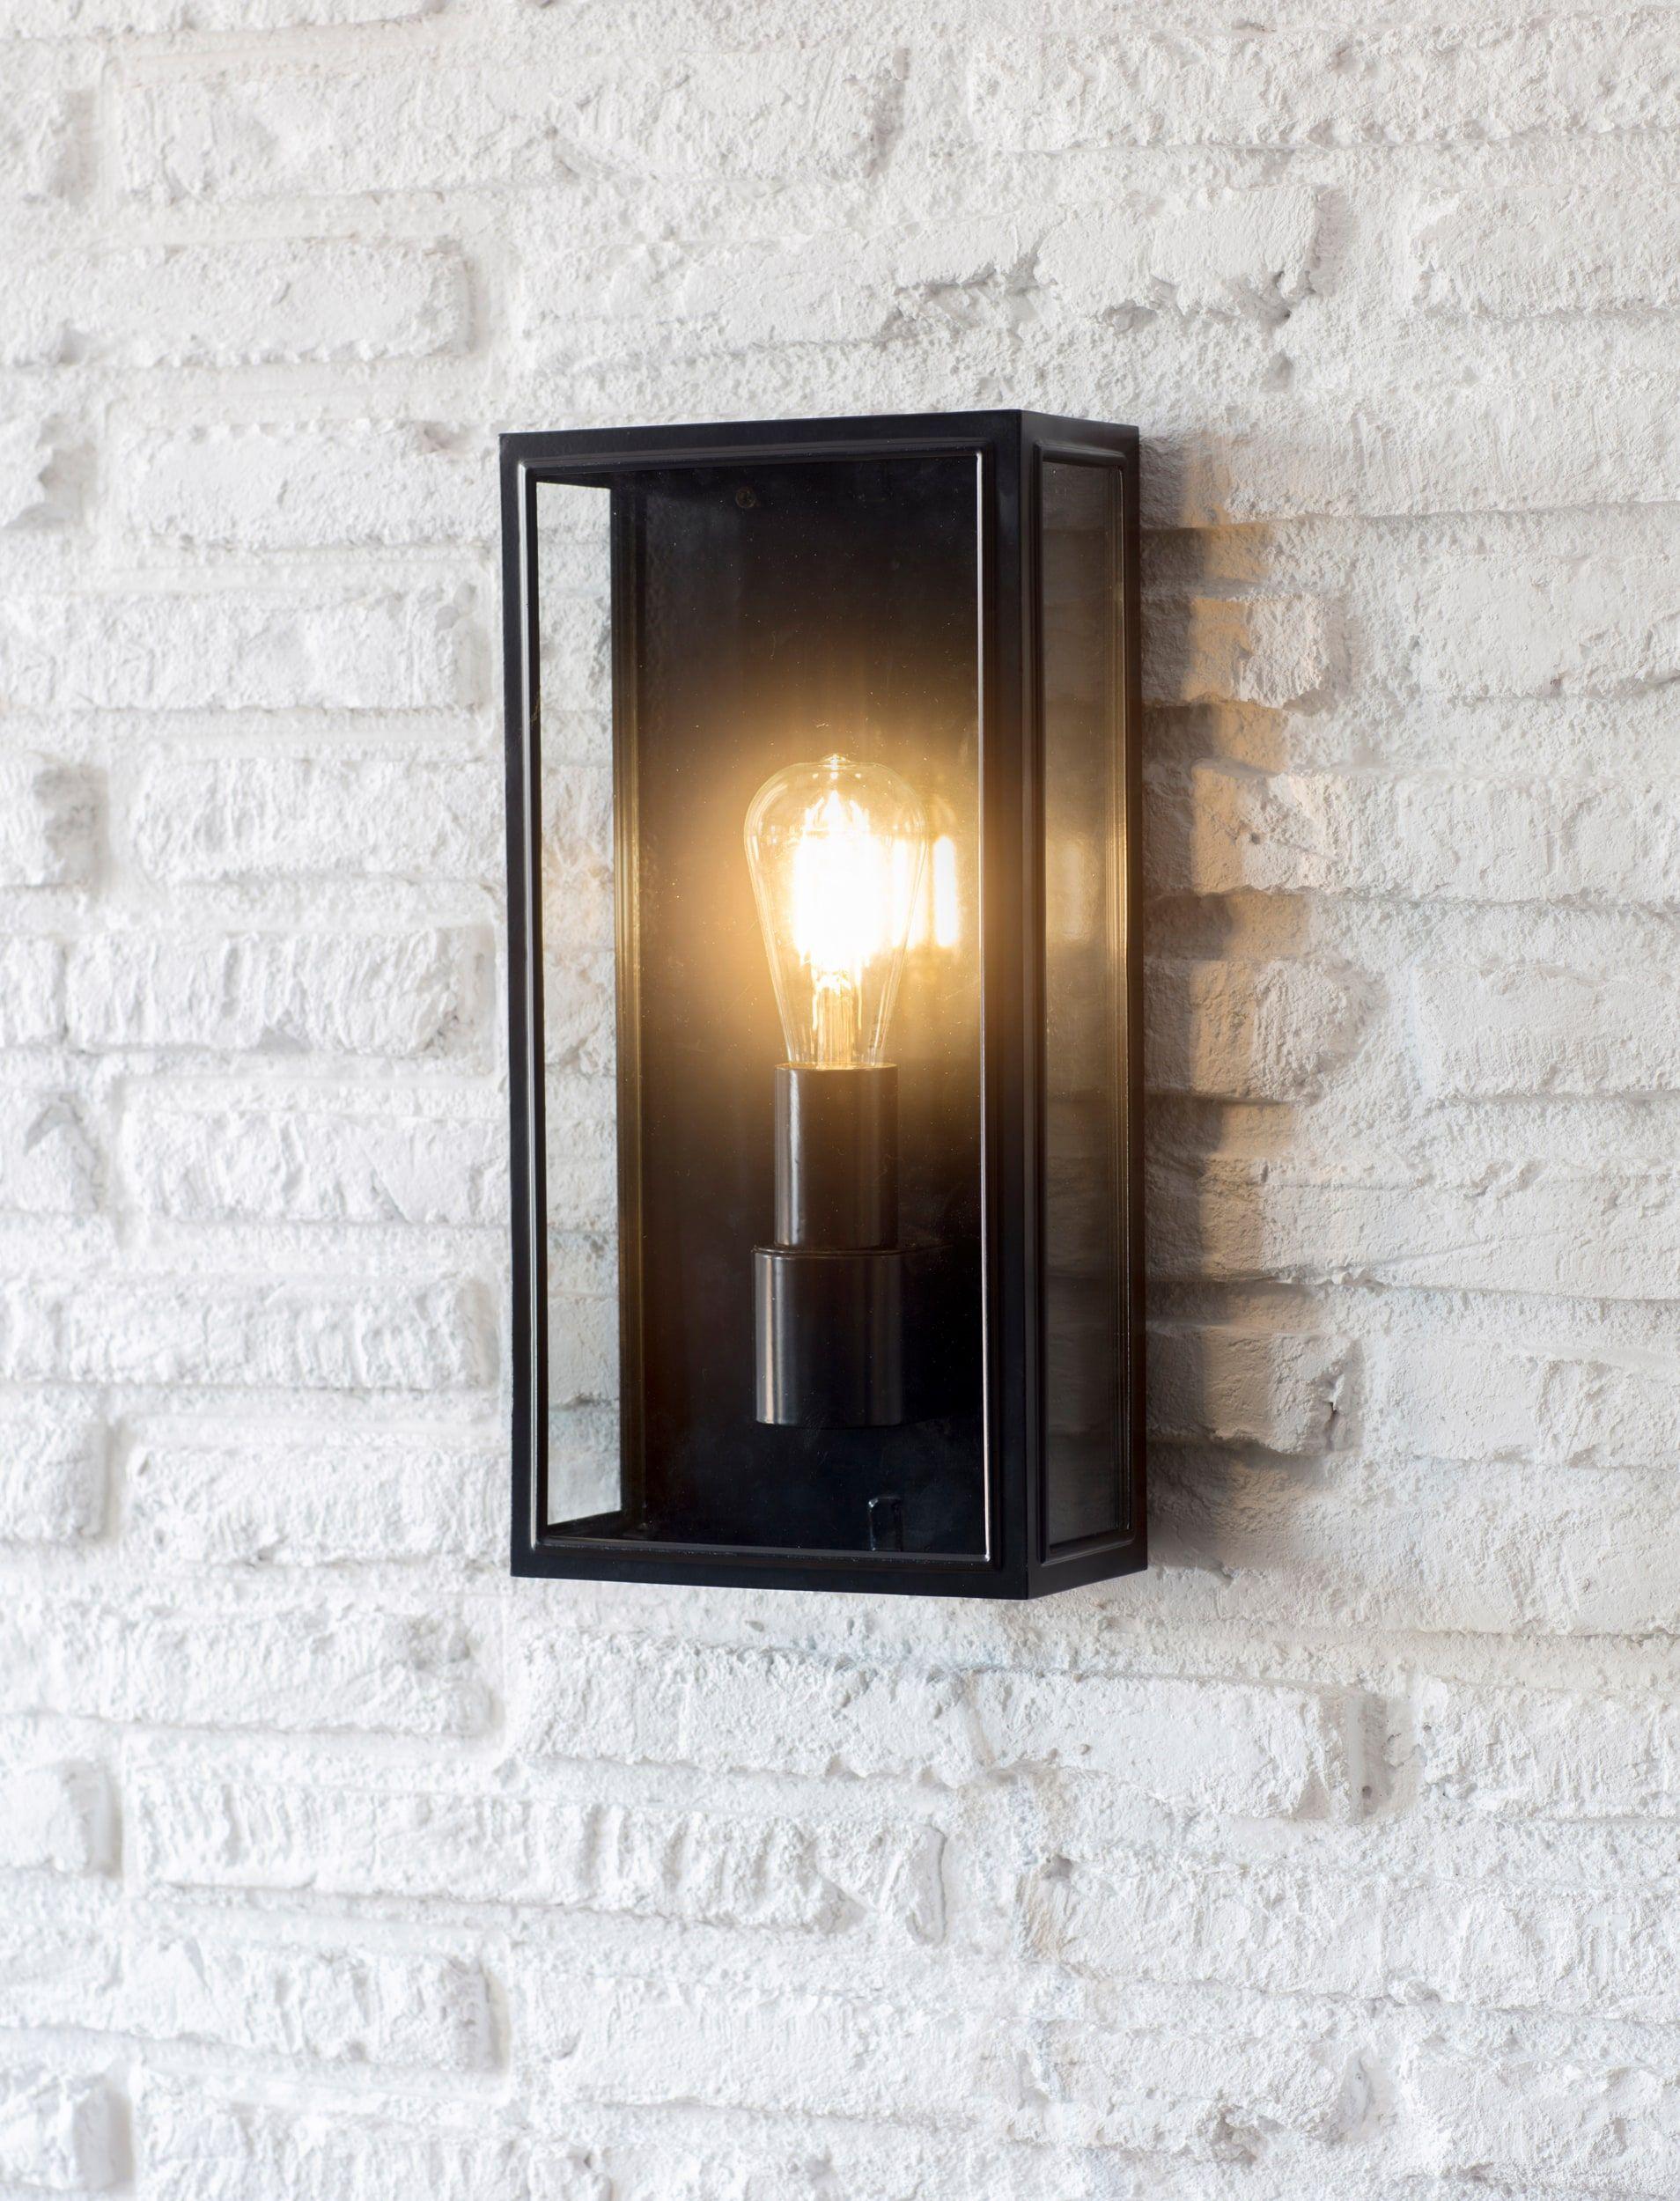 Gartenaccessoires Landhausstil Best Of Landhaus Style Outdoor Lamp